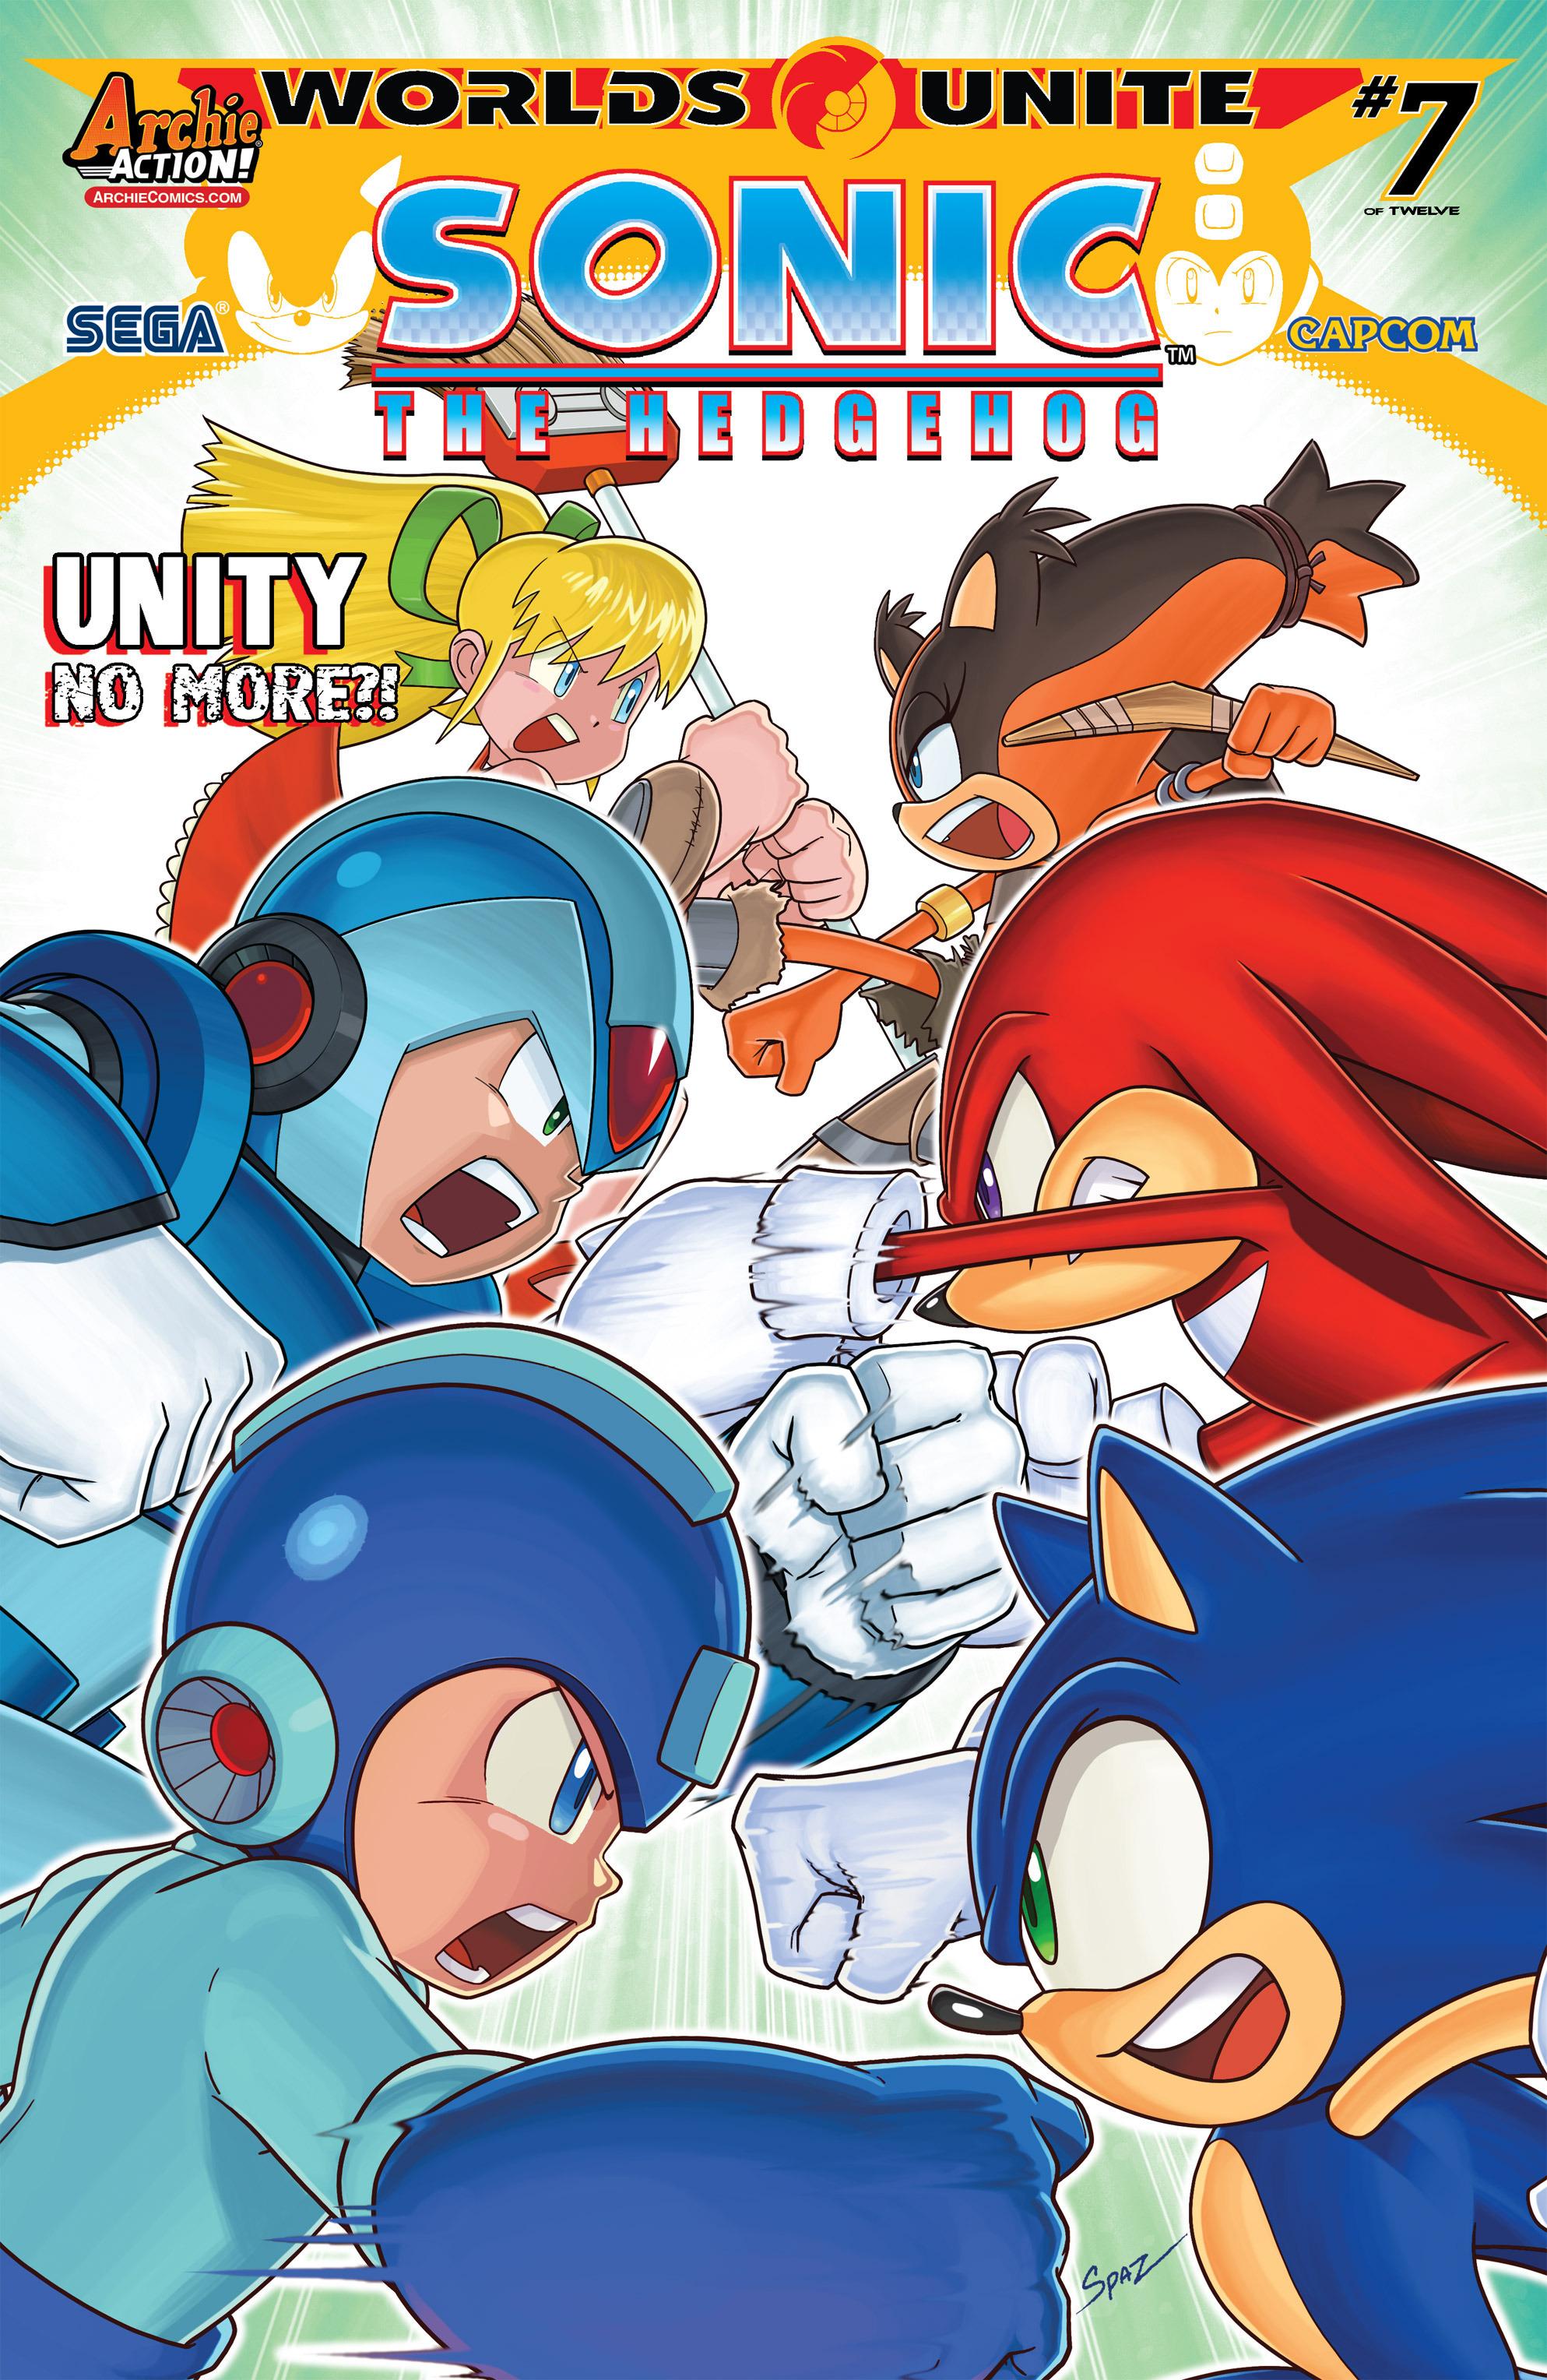 Sonic_The_Hedgehog_-274.jpg